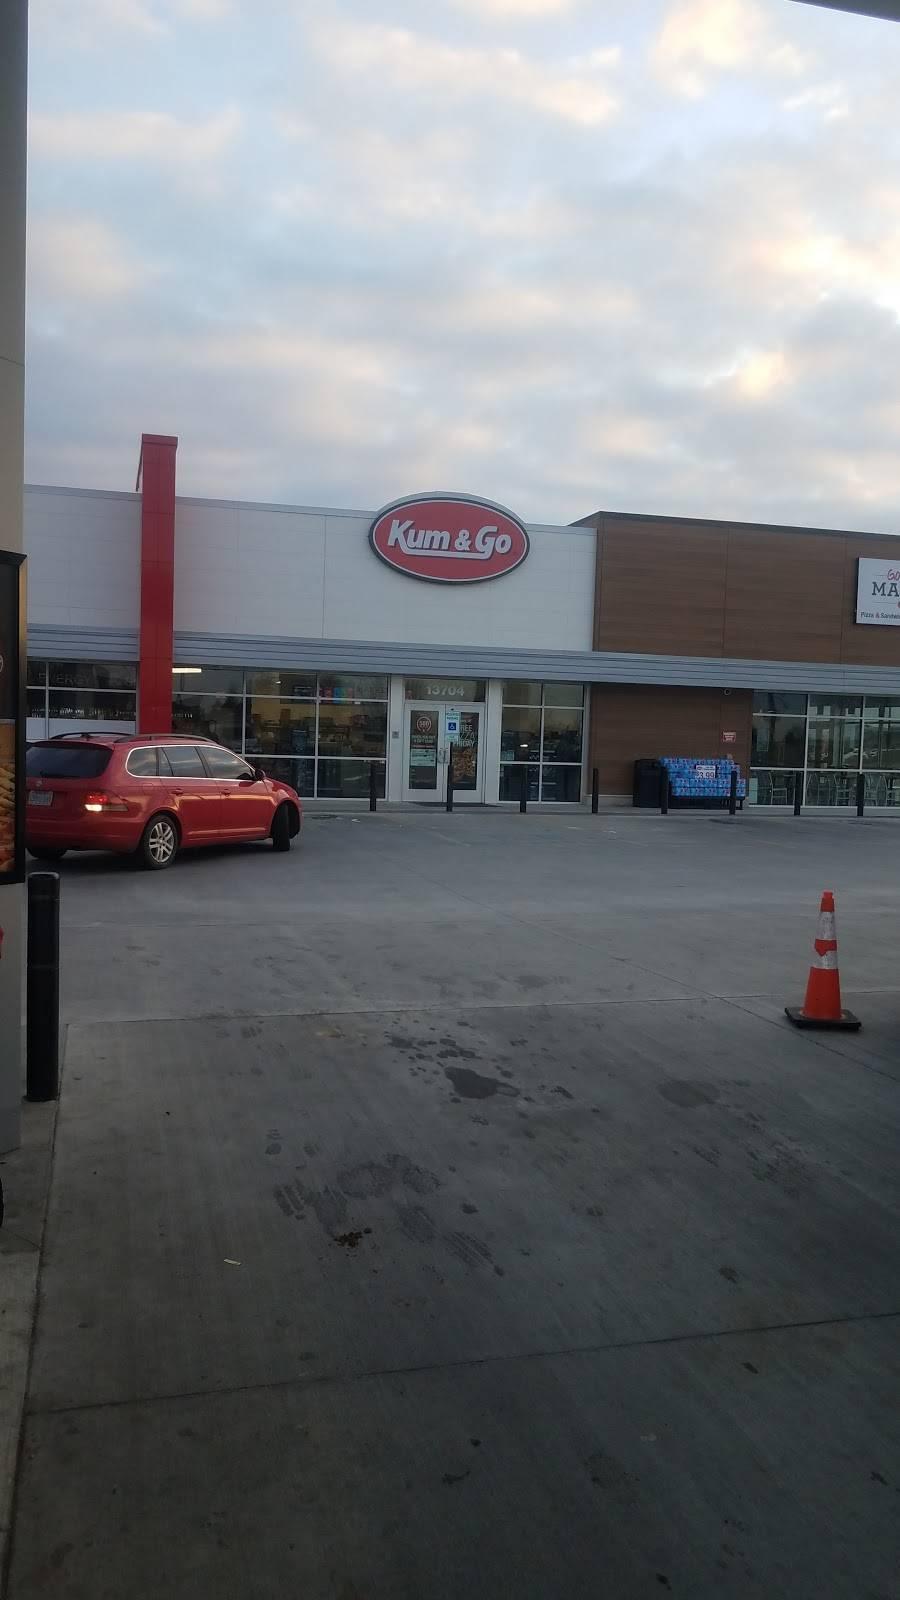 Kum & Go - convenience store  | Photo 1 of 8 | Address: 13704 E 106th St N, Owasso, OK 74055, USA | Phone: (918) 272-8661